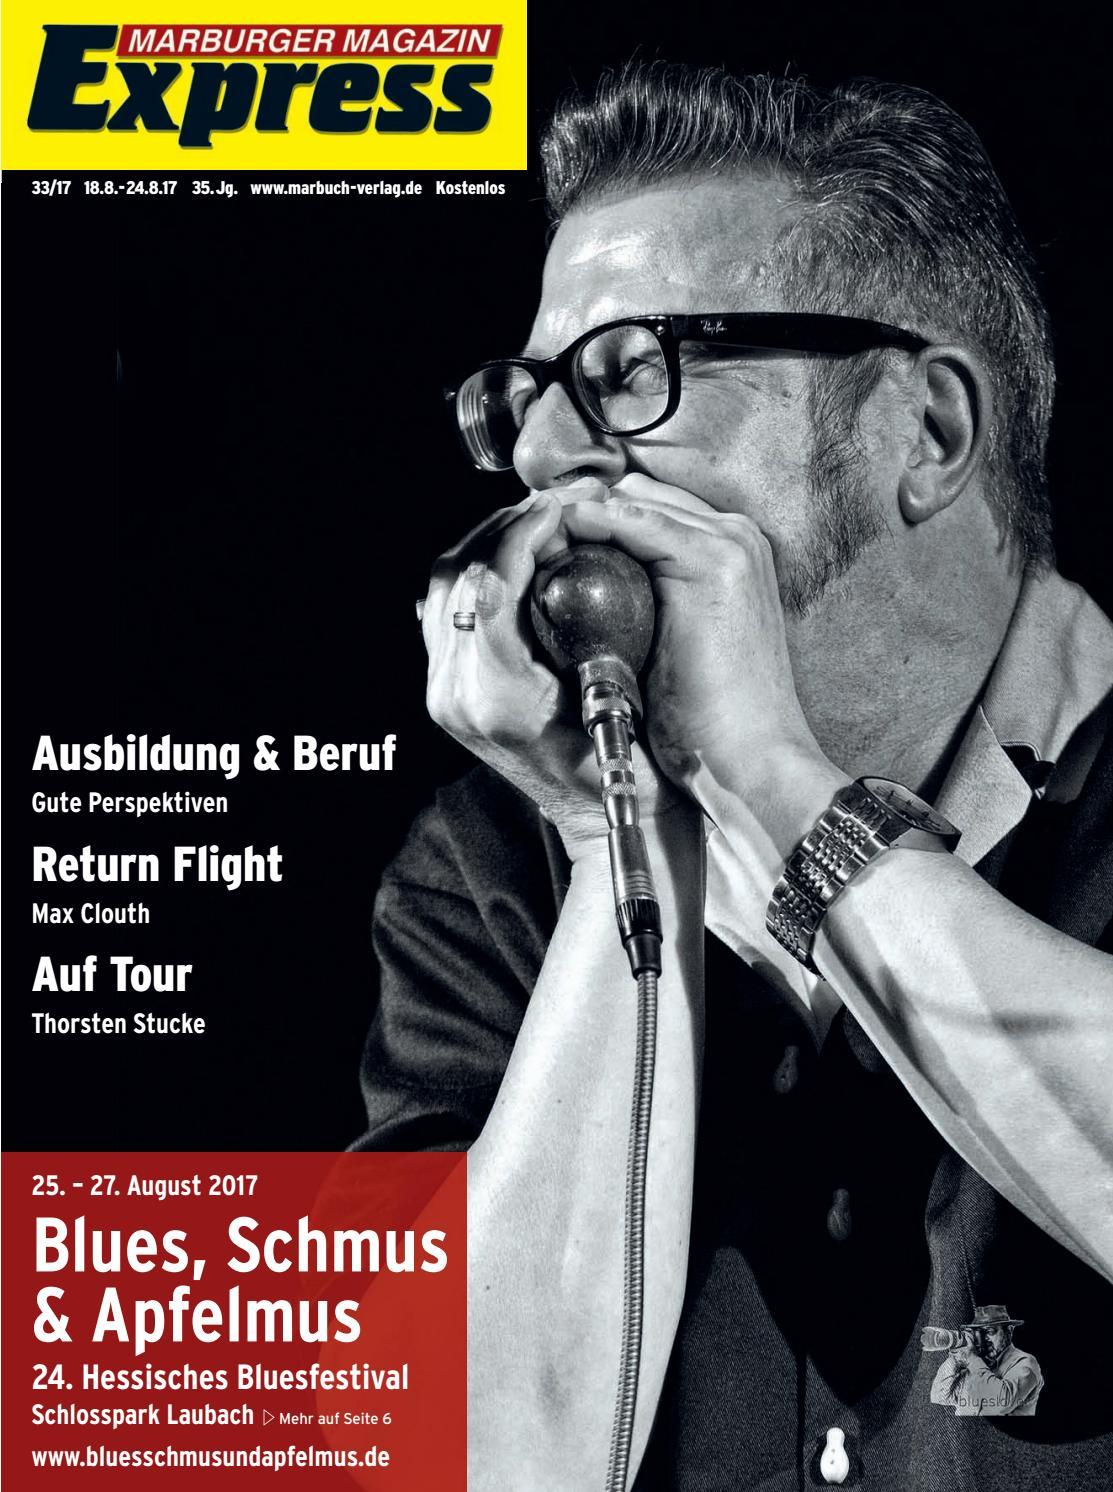 Blues schmus apfelmus